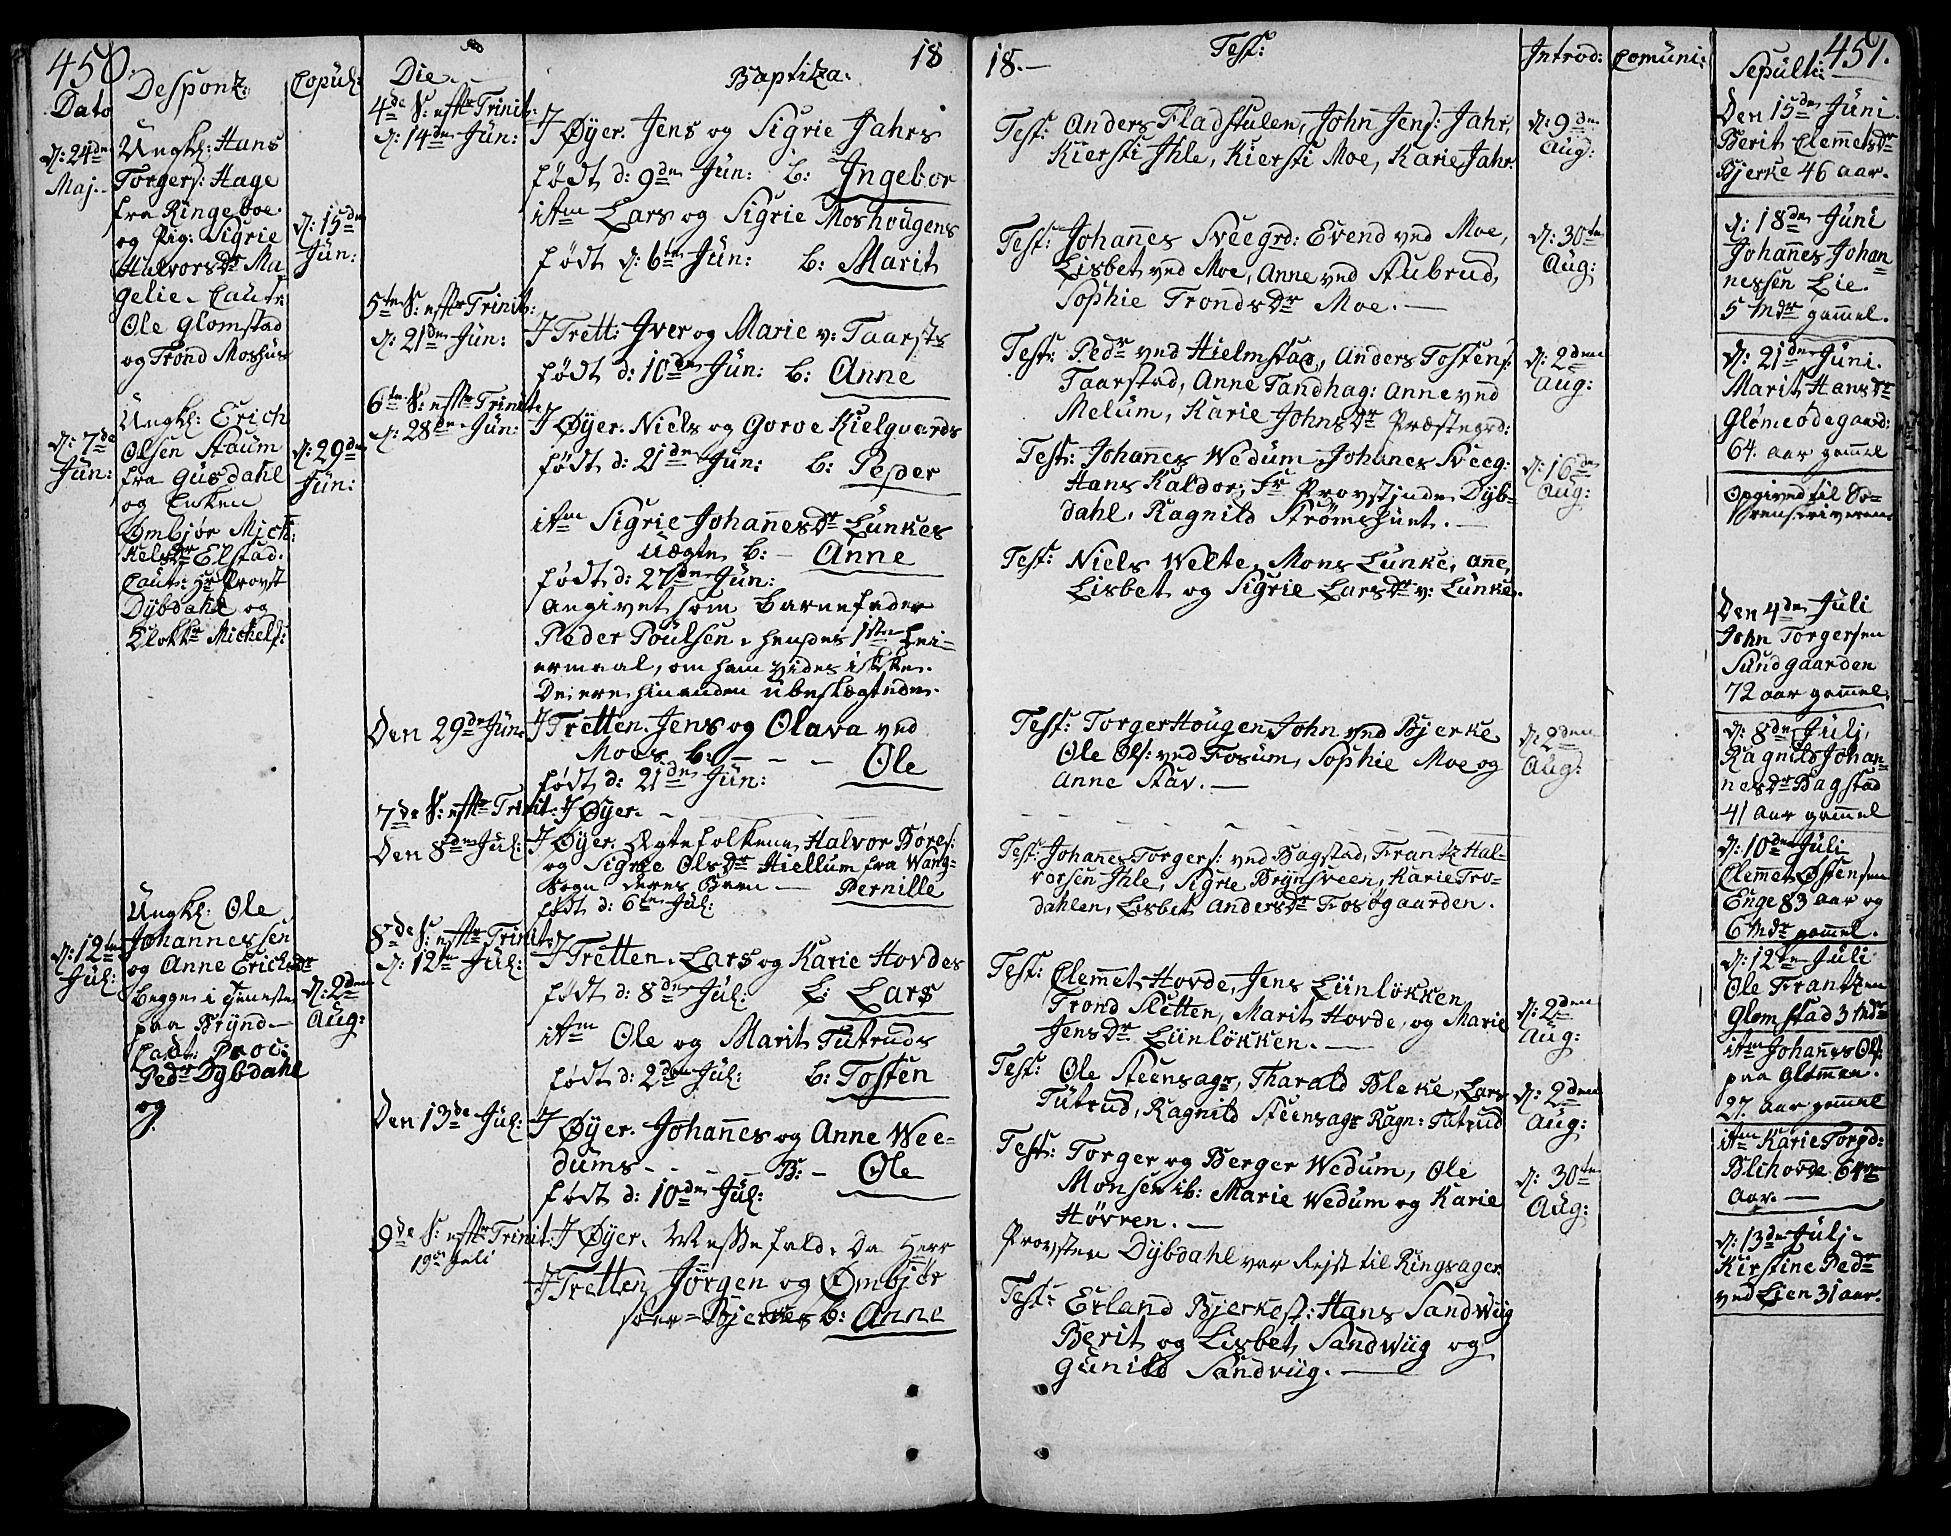 SAH, Øyer prestekontor, Ministerialbok nr. 3, 1784-1824, s. 450-451